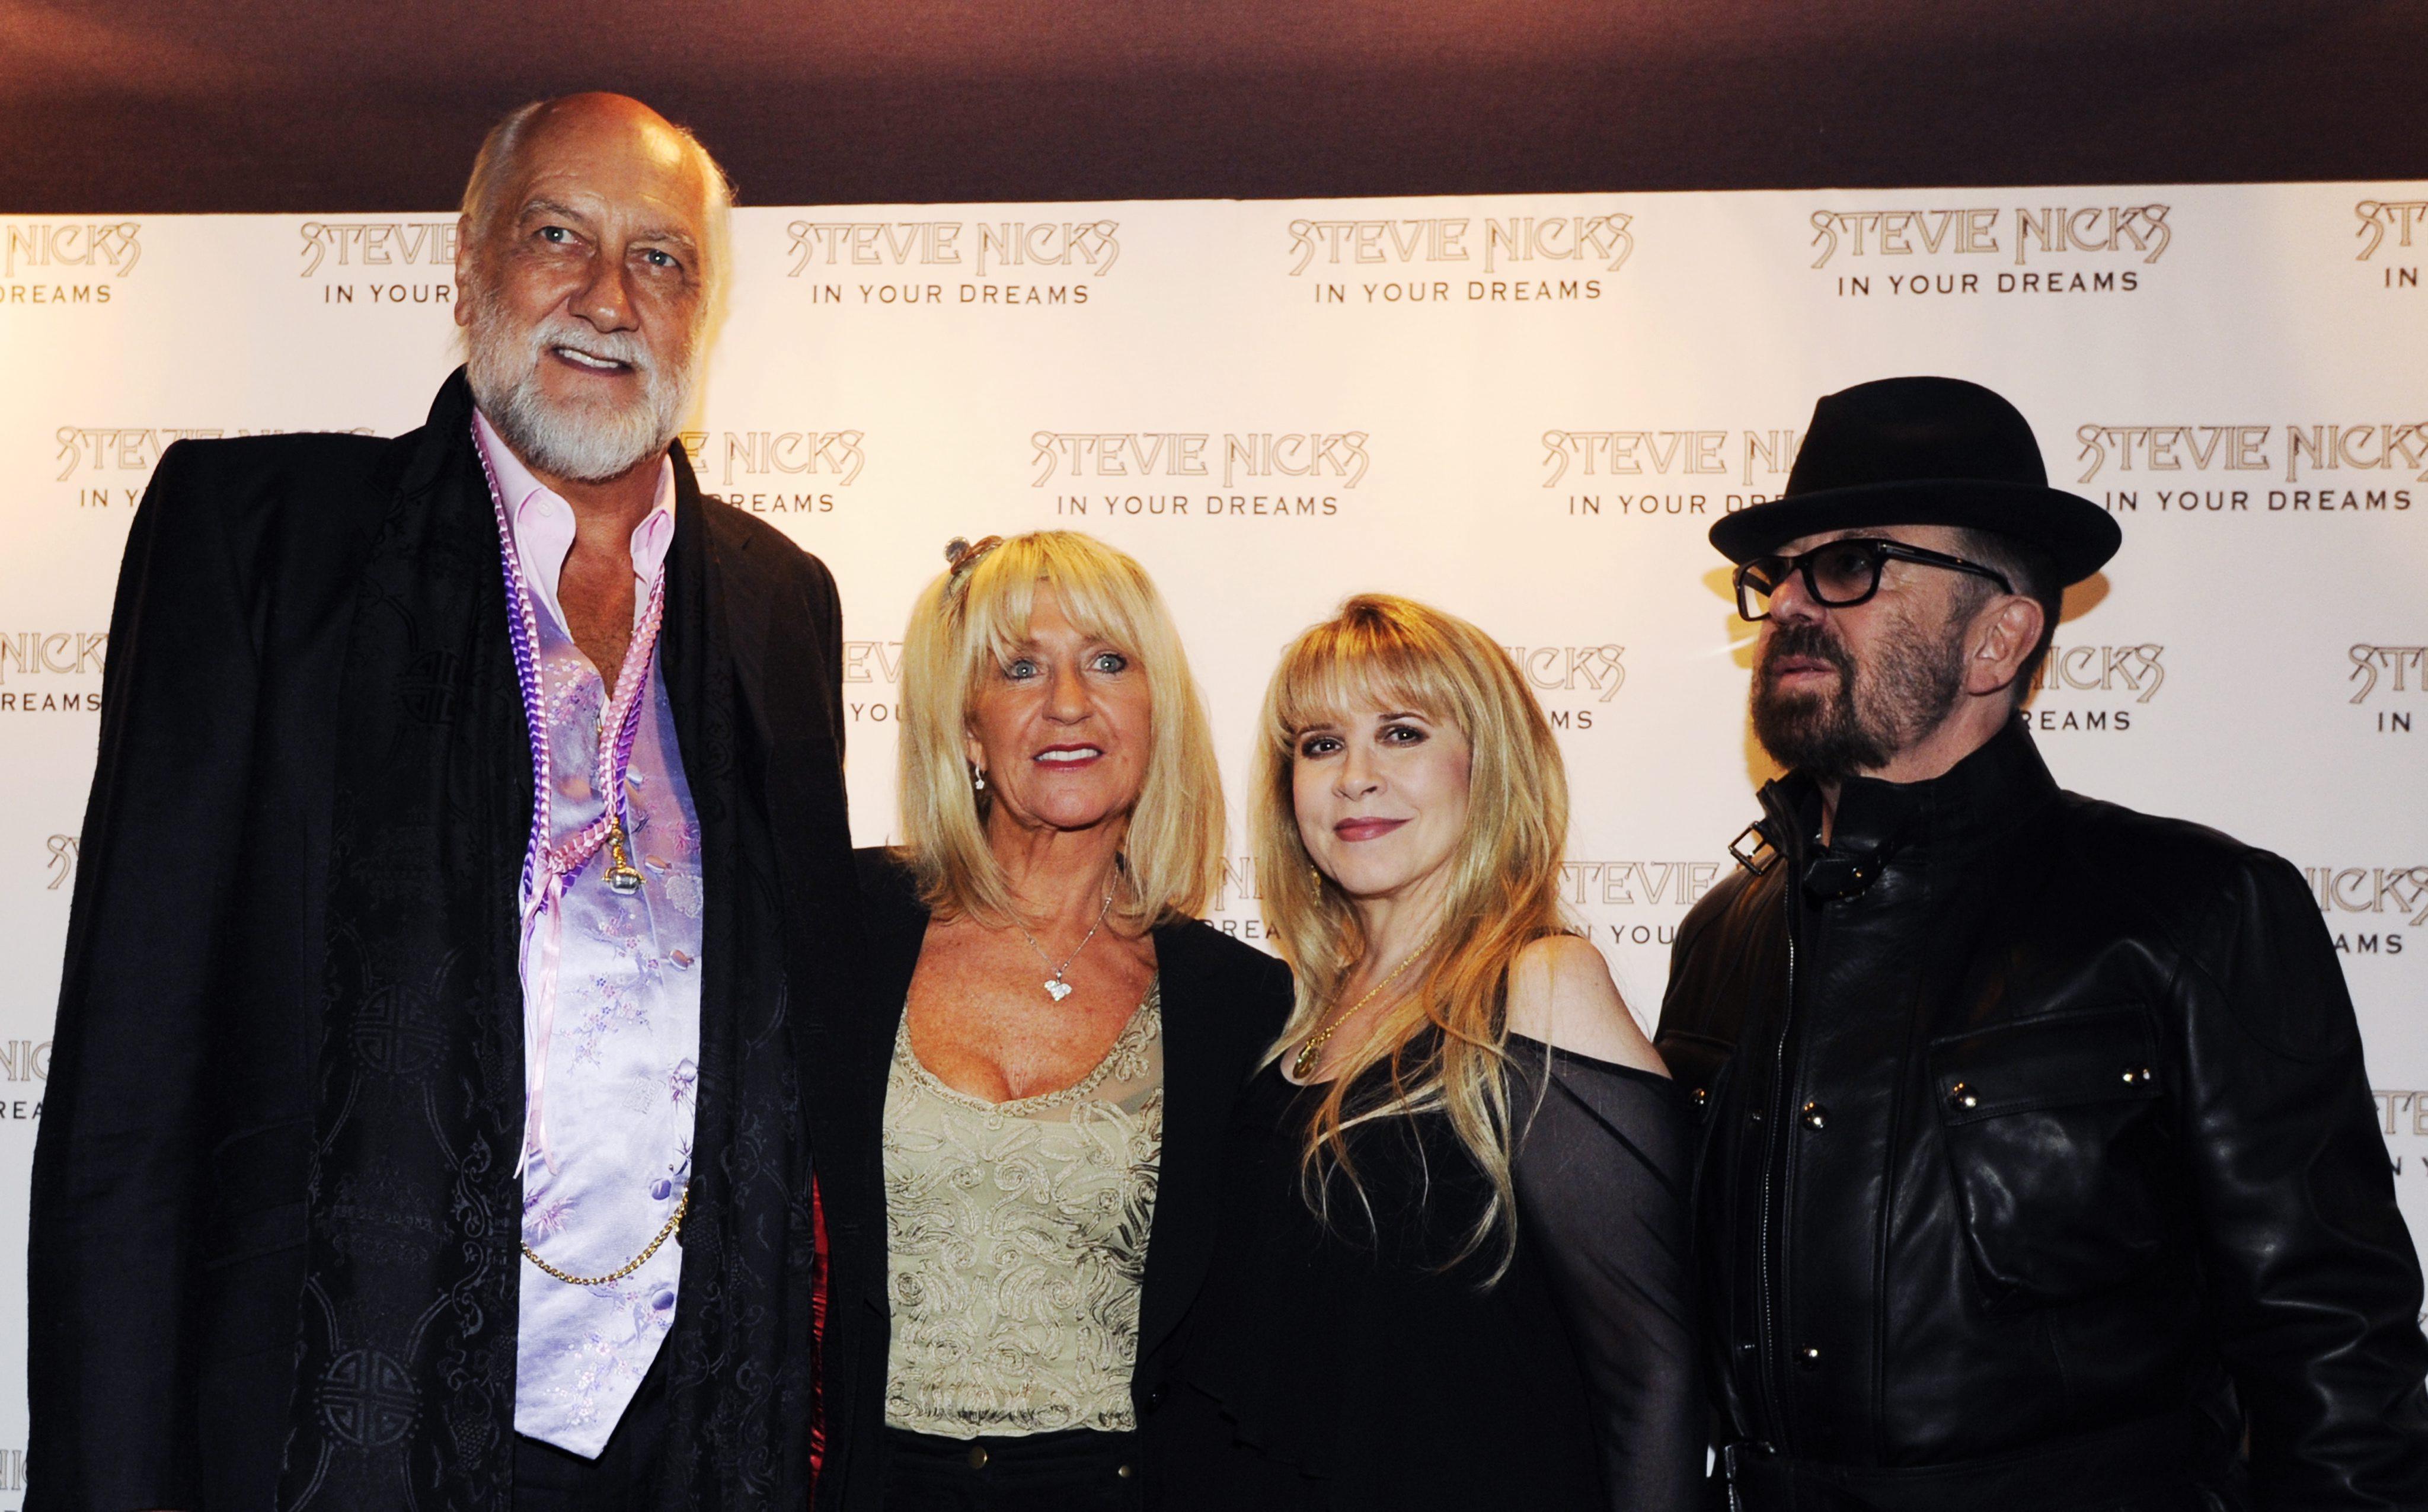 Fleetwood Mac won't be going their own way to Glastonbury 2015